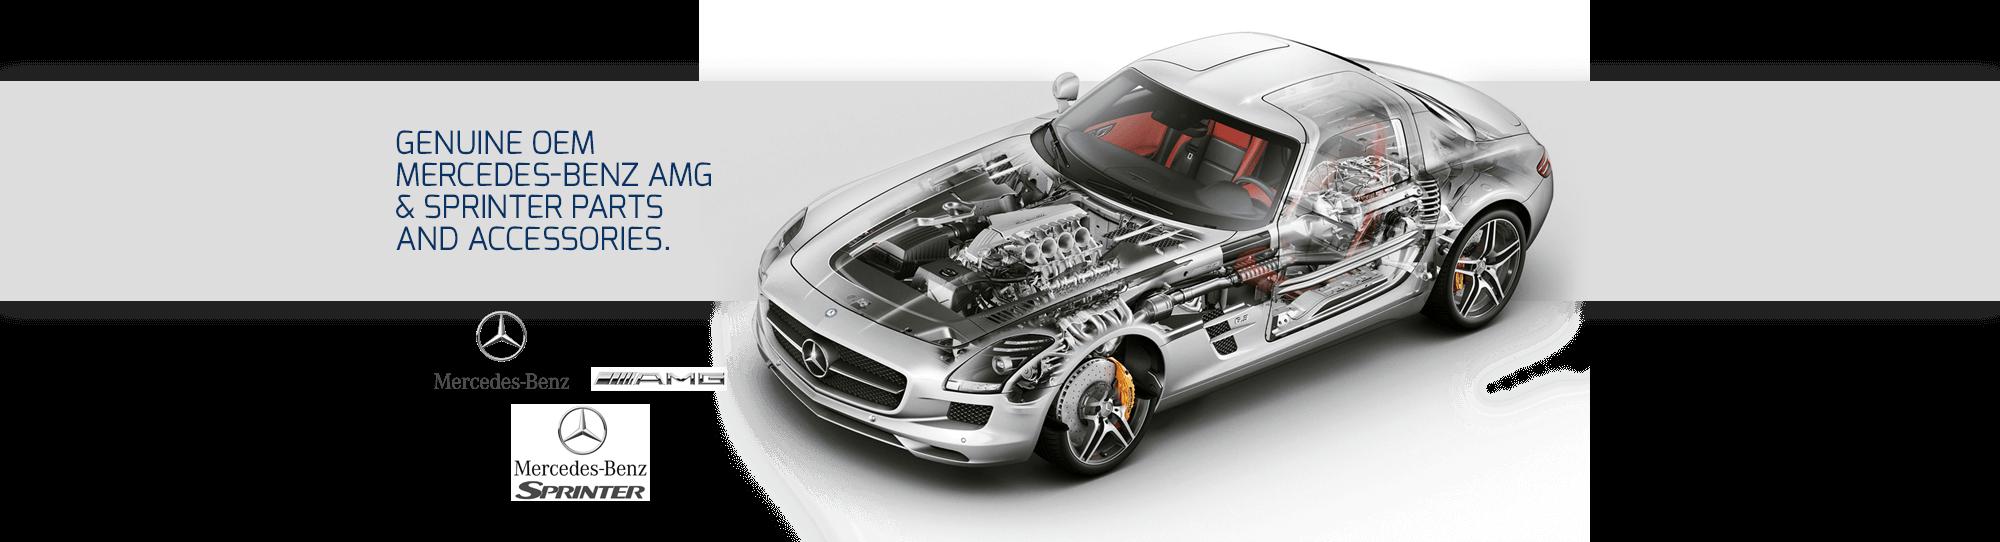 Genuine OEM Mercedes-Benz AMG & Sprinter Parts and Accessories.